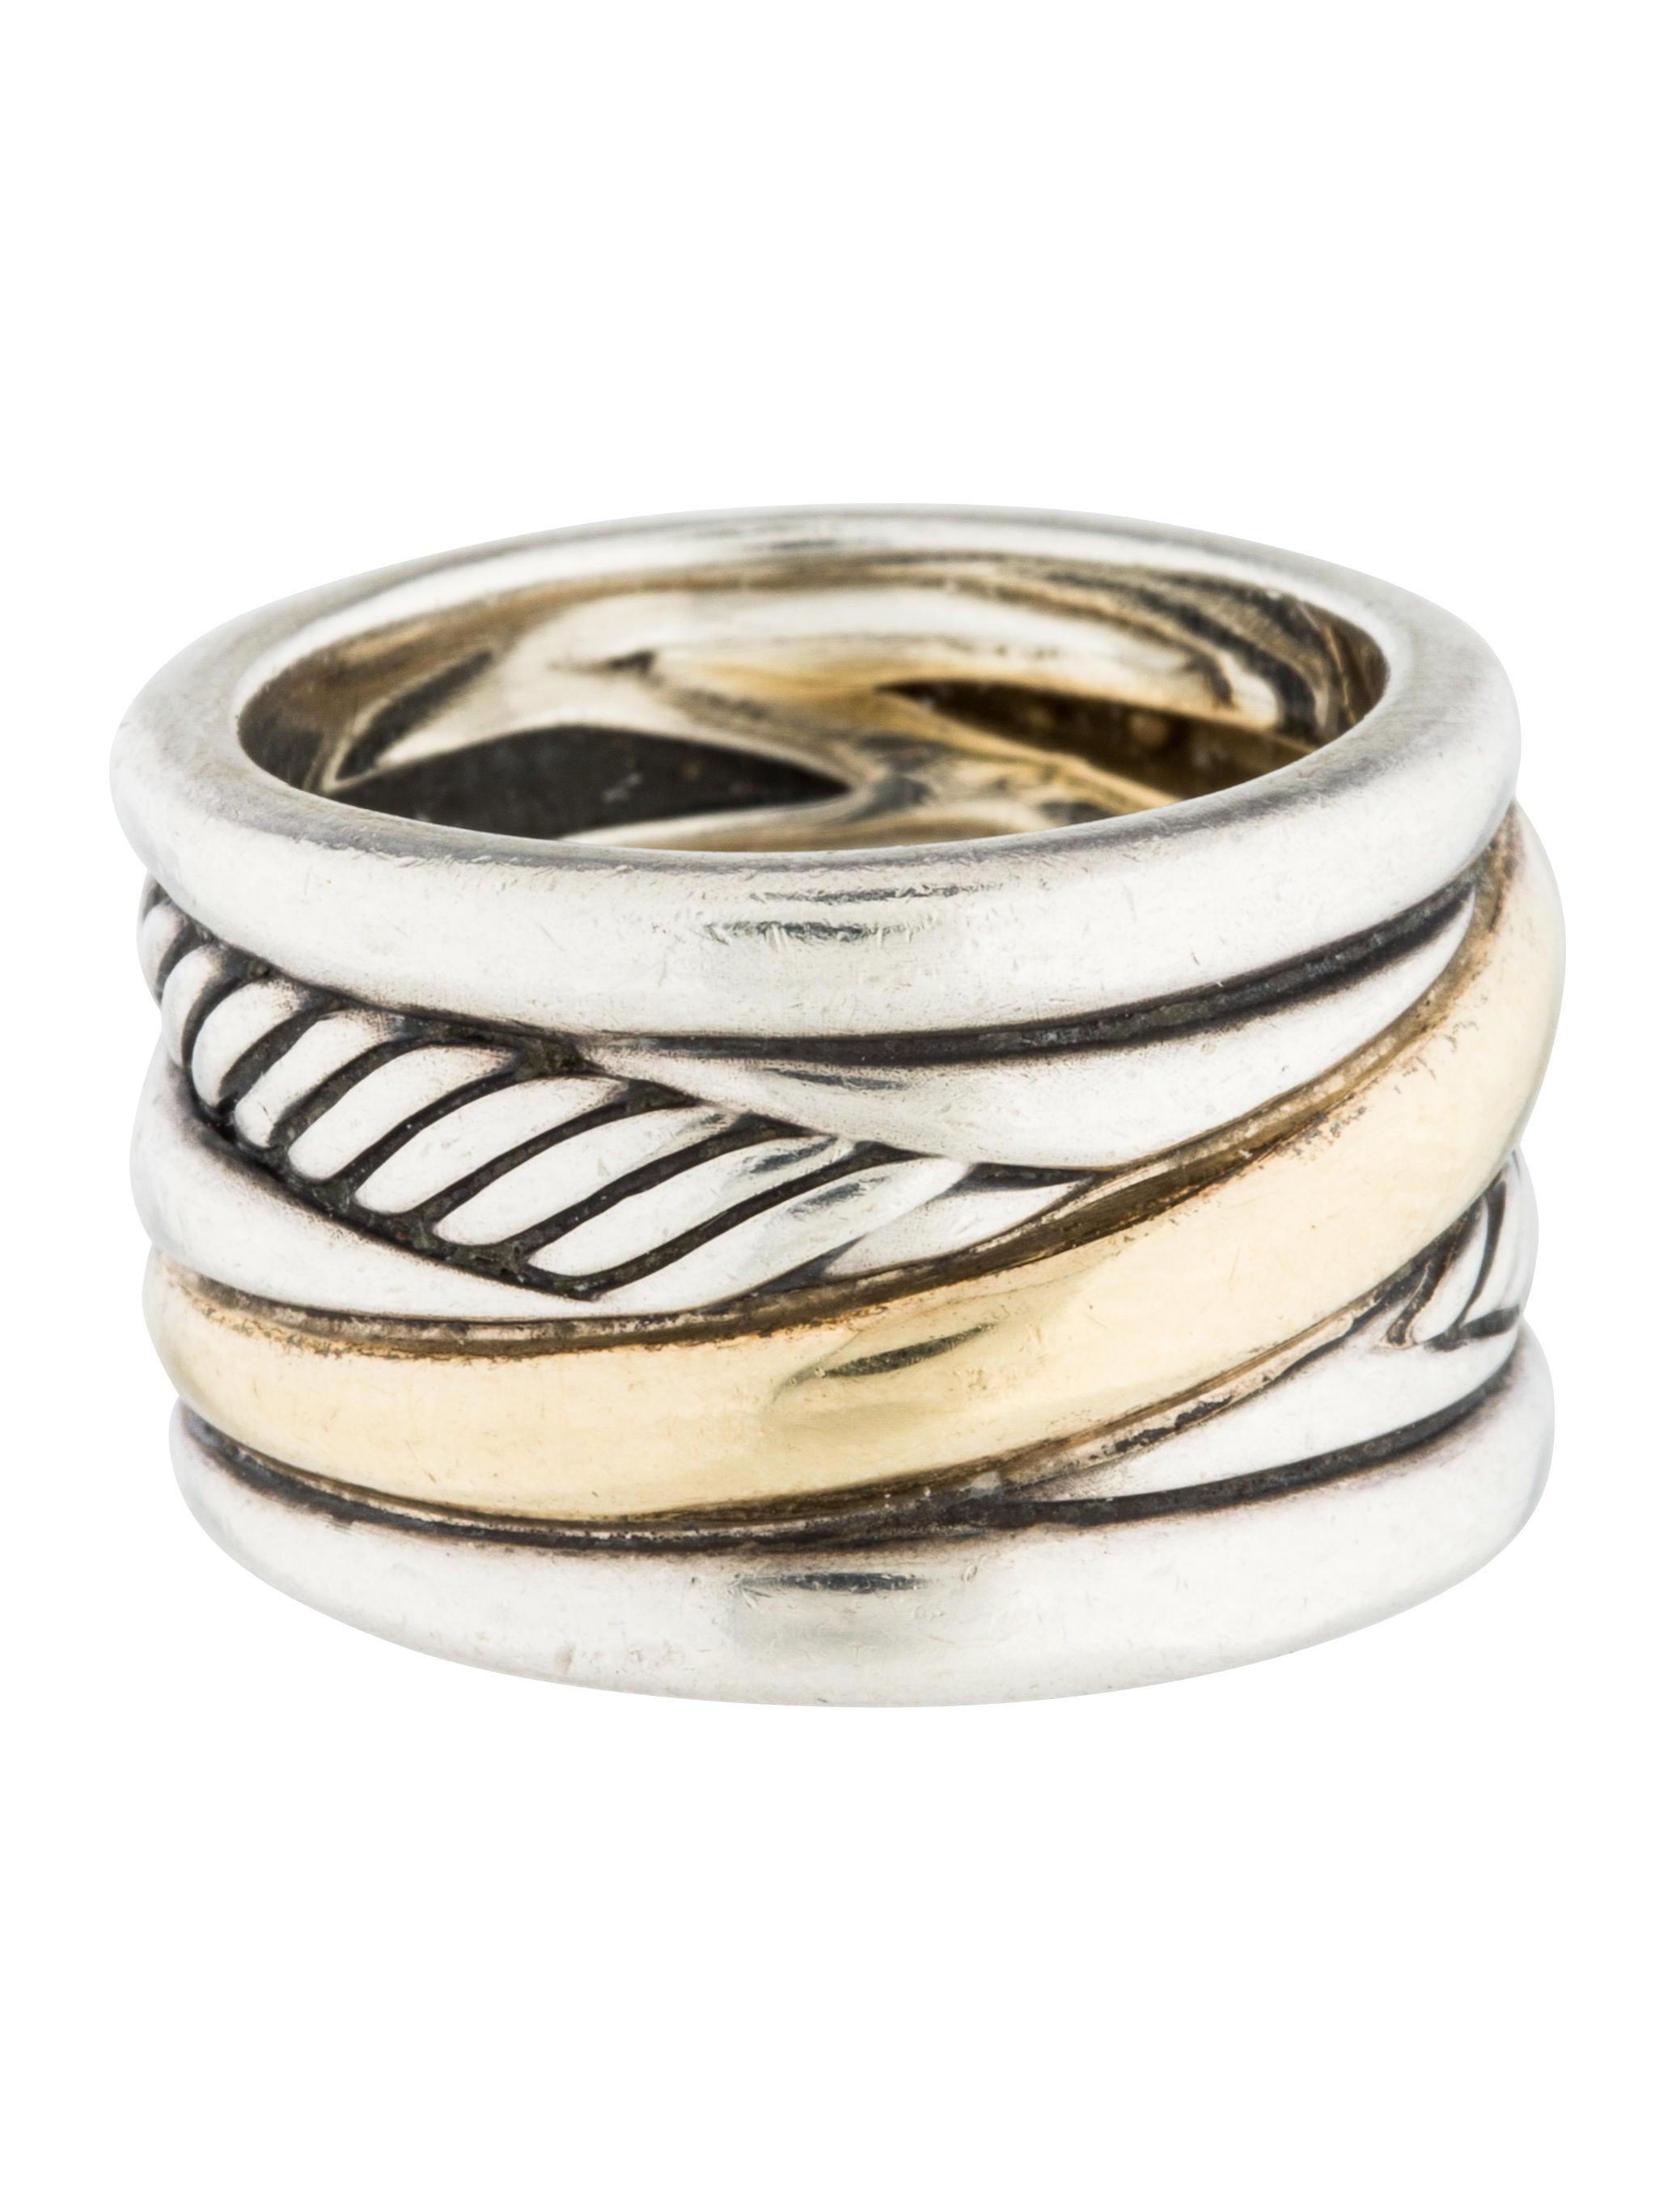 David yurman two tone cable ring rings dvy38852 the for David yurman inspired jewelry rings